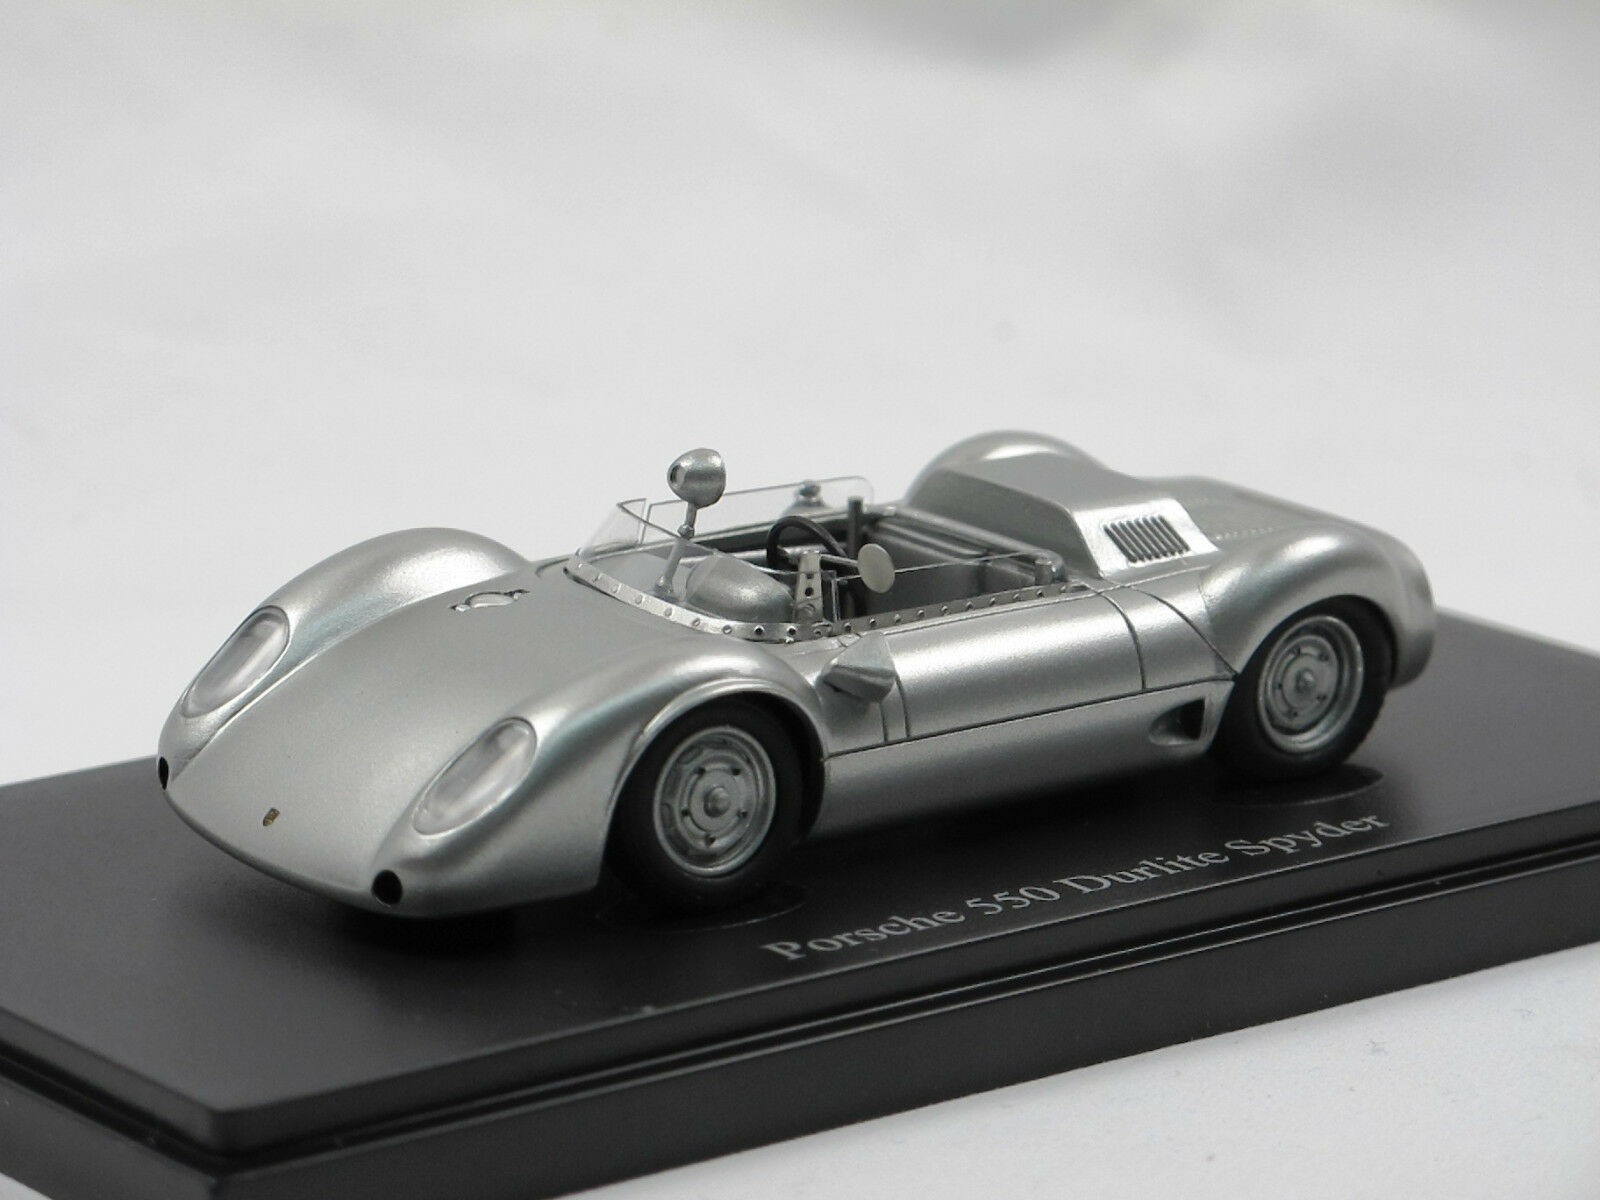 AutoCult Models 07007, 1959 Porsche 550 Durlite Spyder 1 43 Limited Edition  | Spezielle Funktion